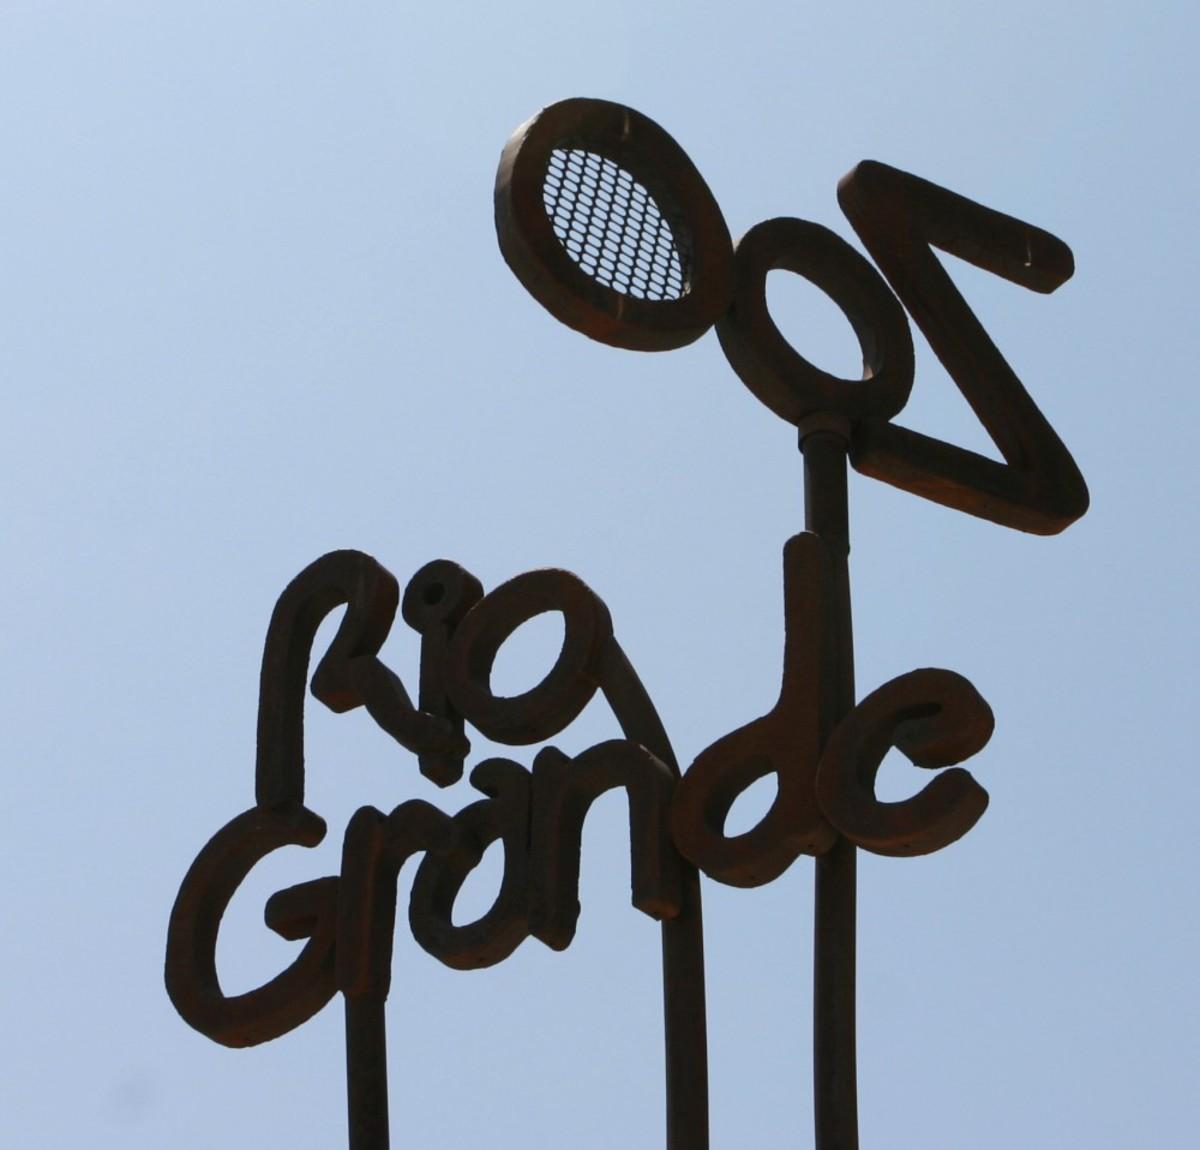 Rio Grande Zoo sign